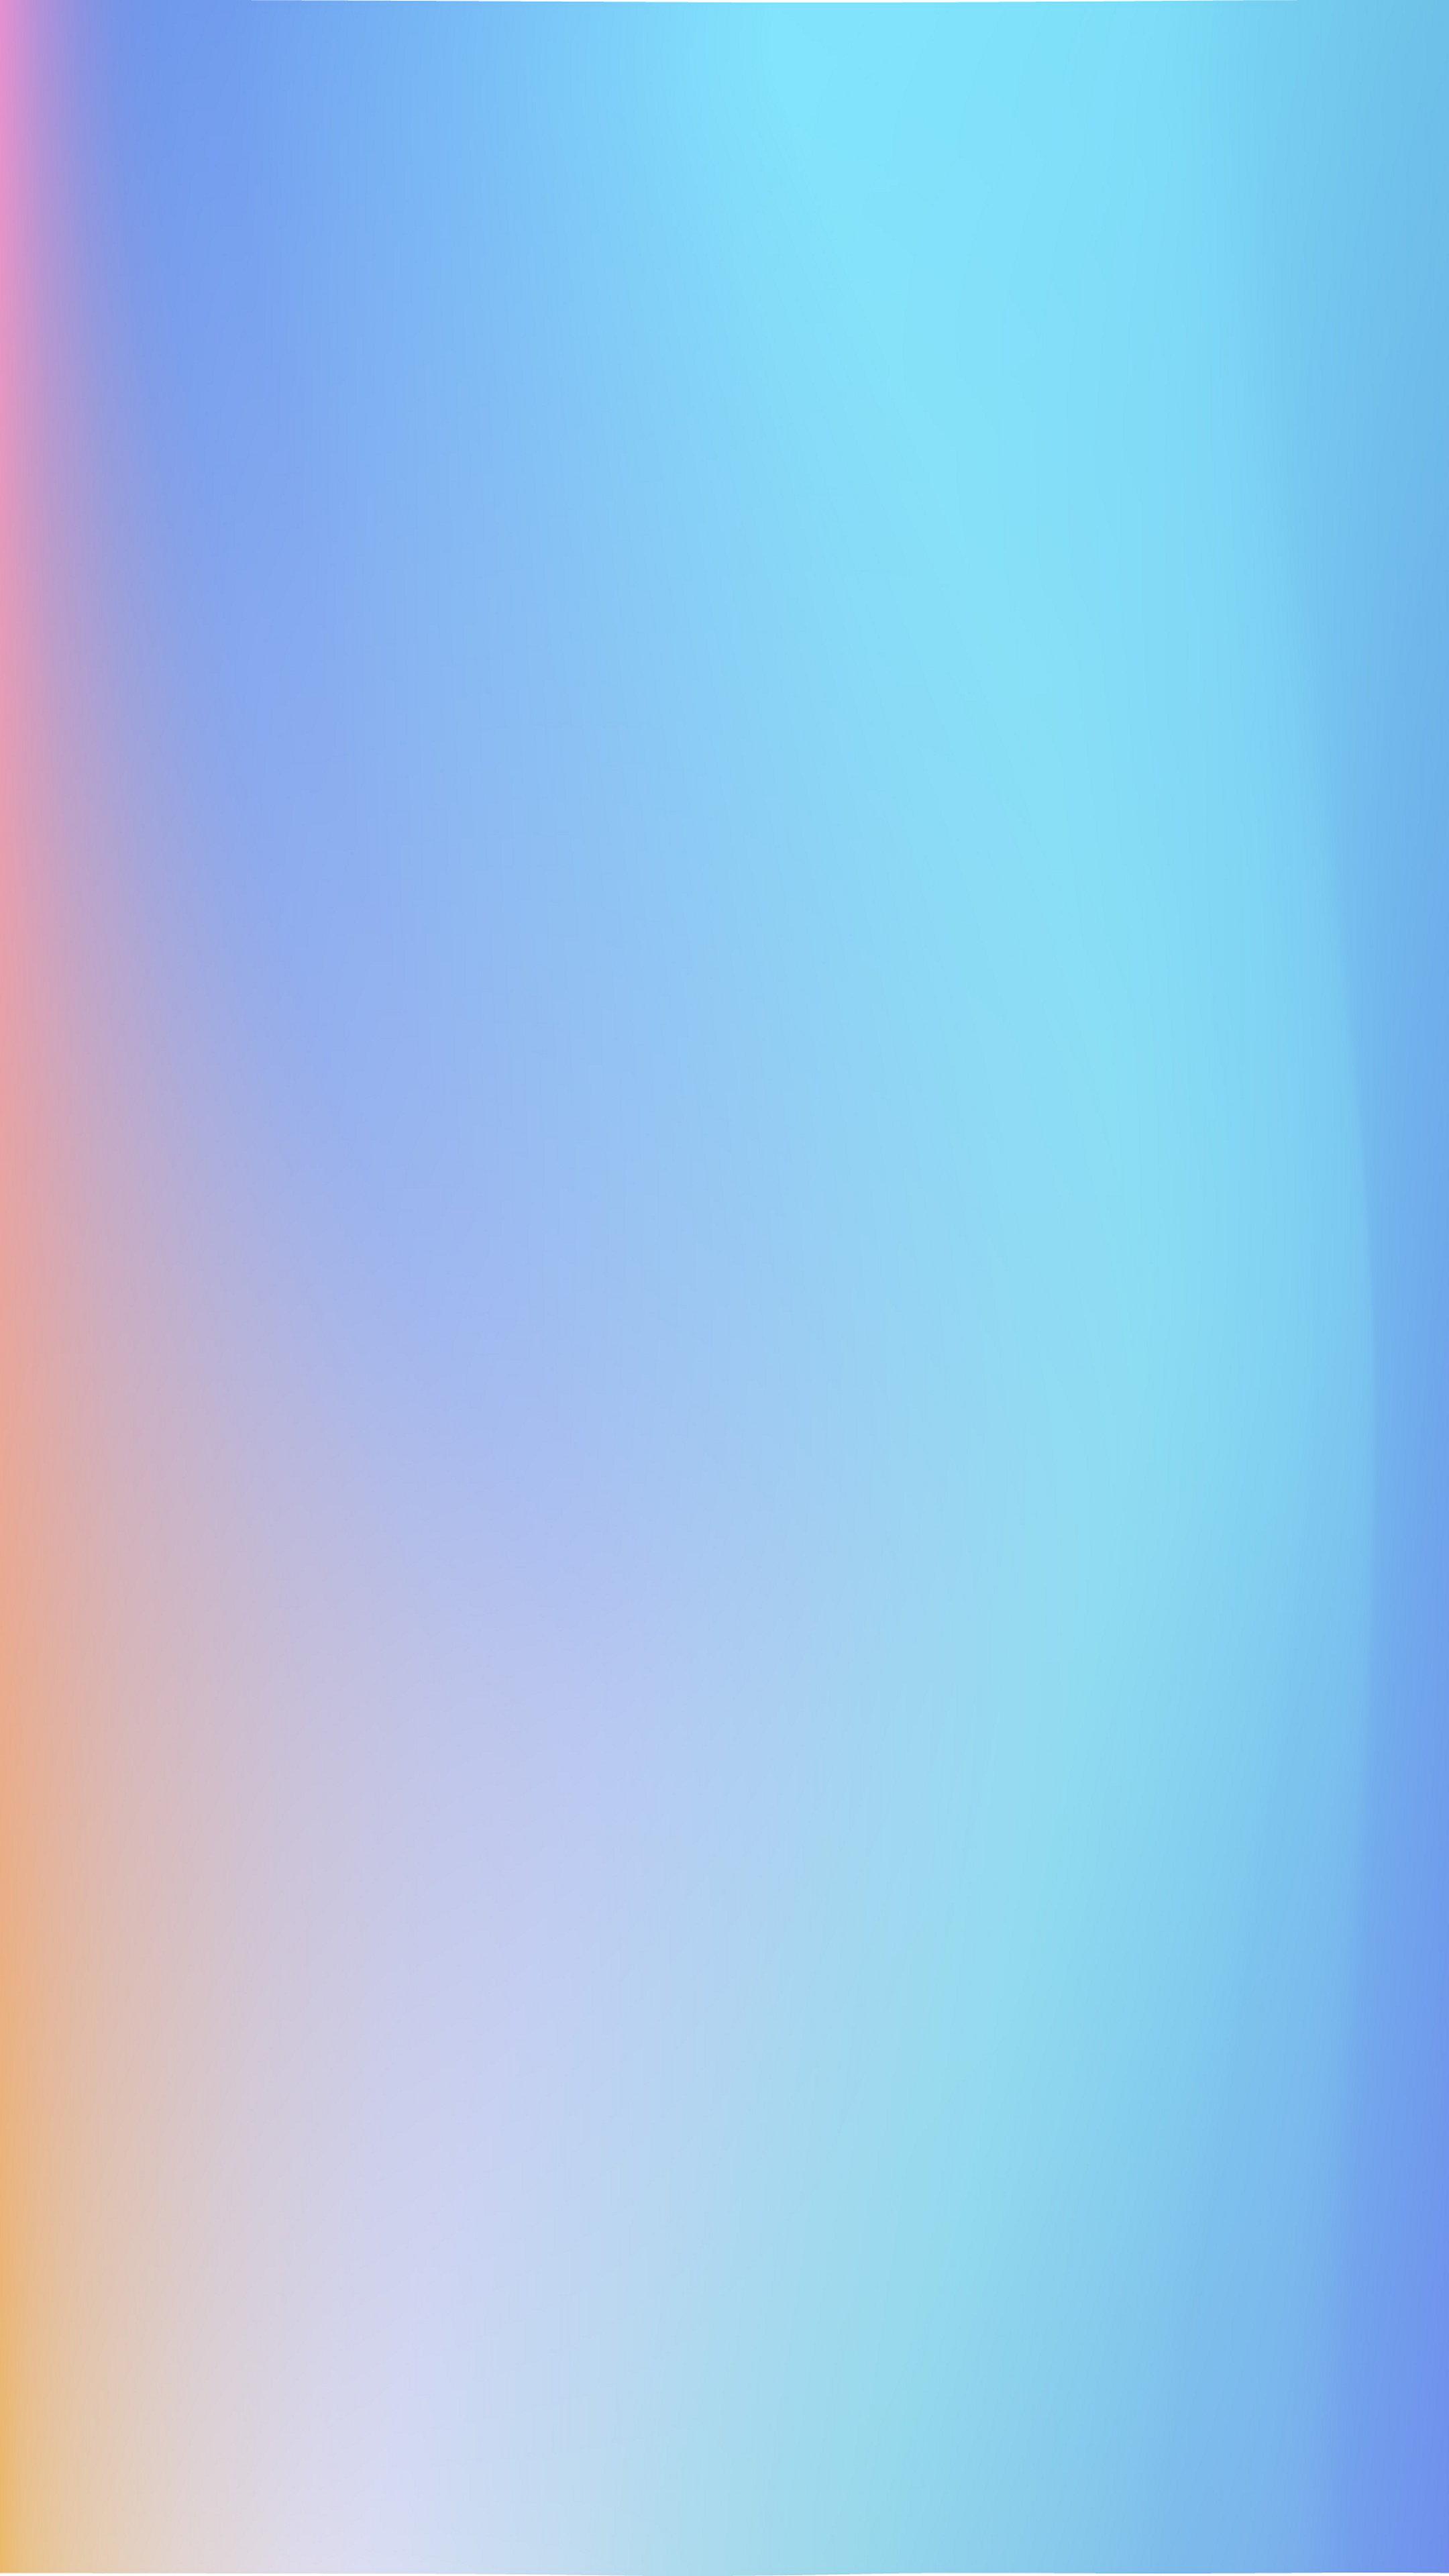 Pink Sky Blue Gradient Wallpaper